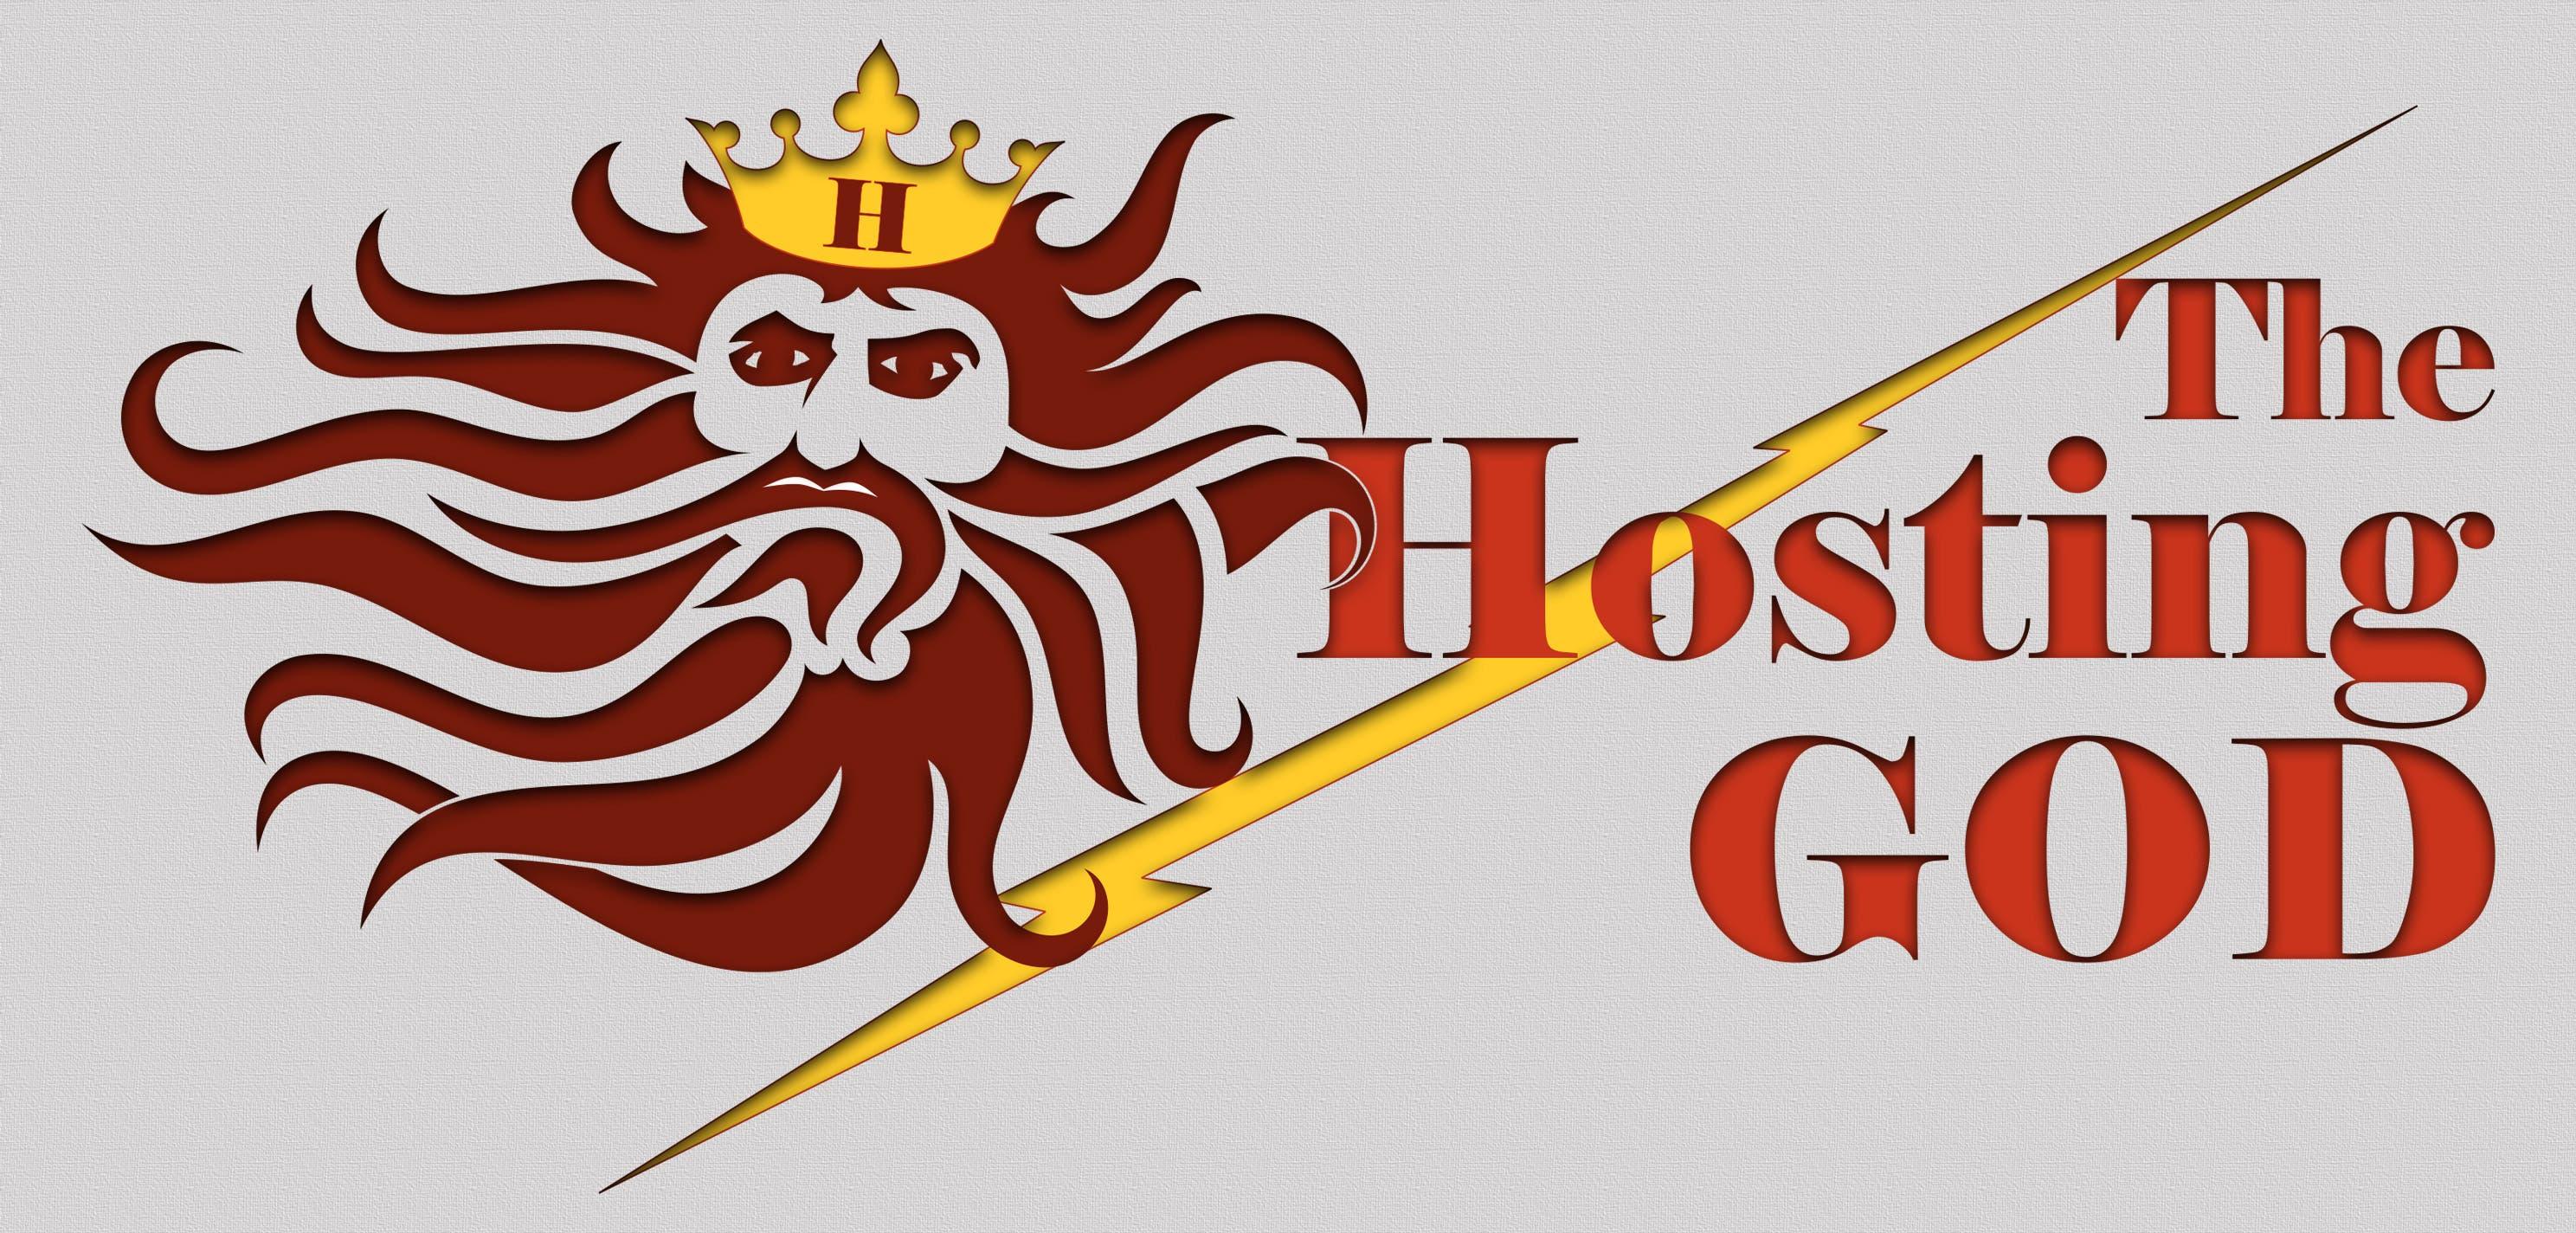 Hg_design